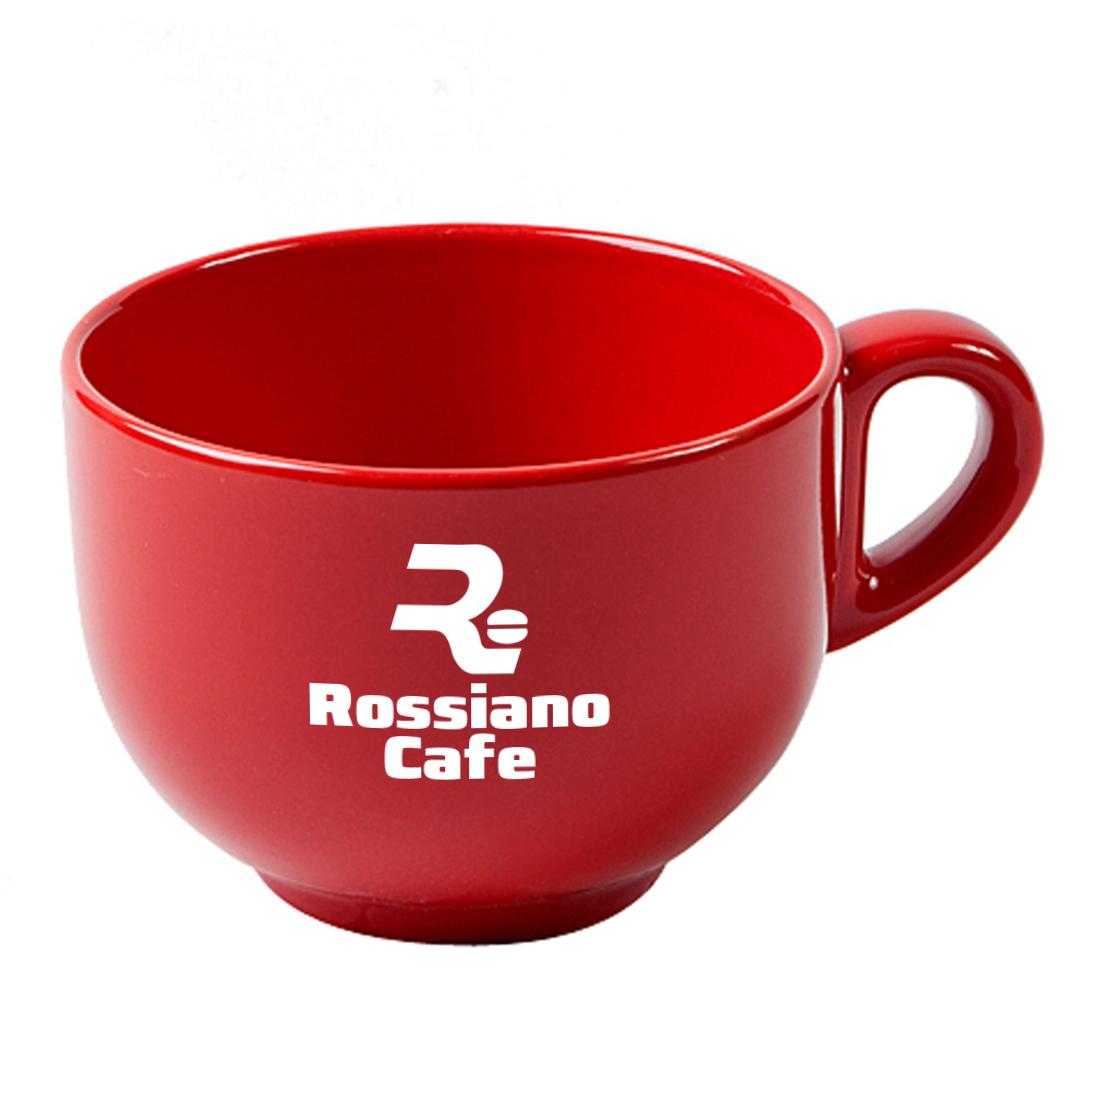 Логотип для кофейного бренда «Rossiano cafe». фото f_95657c7d513ad153.jpg